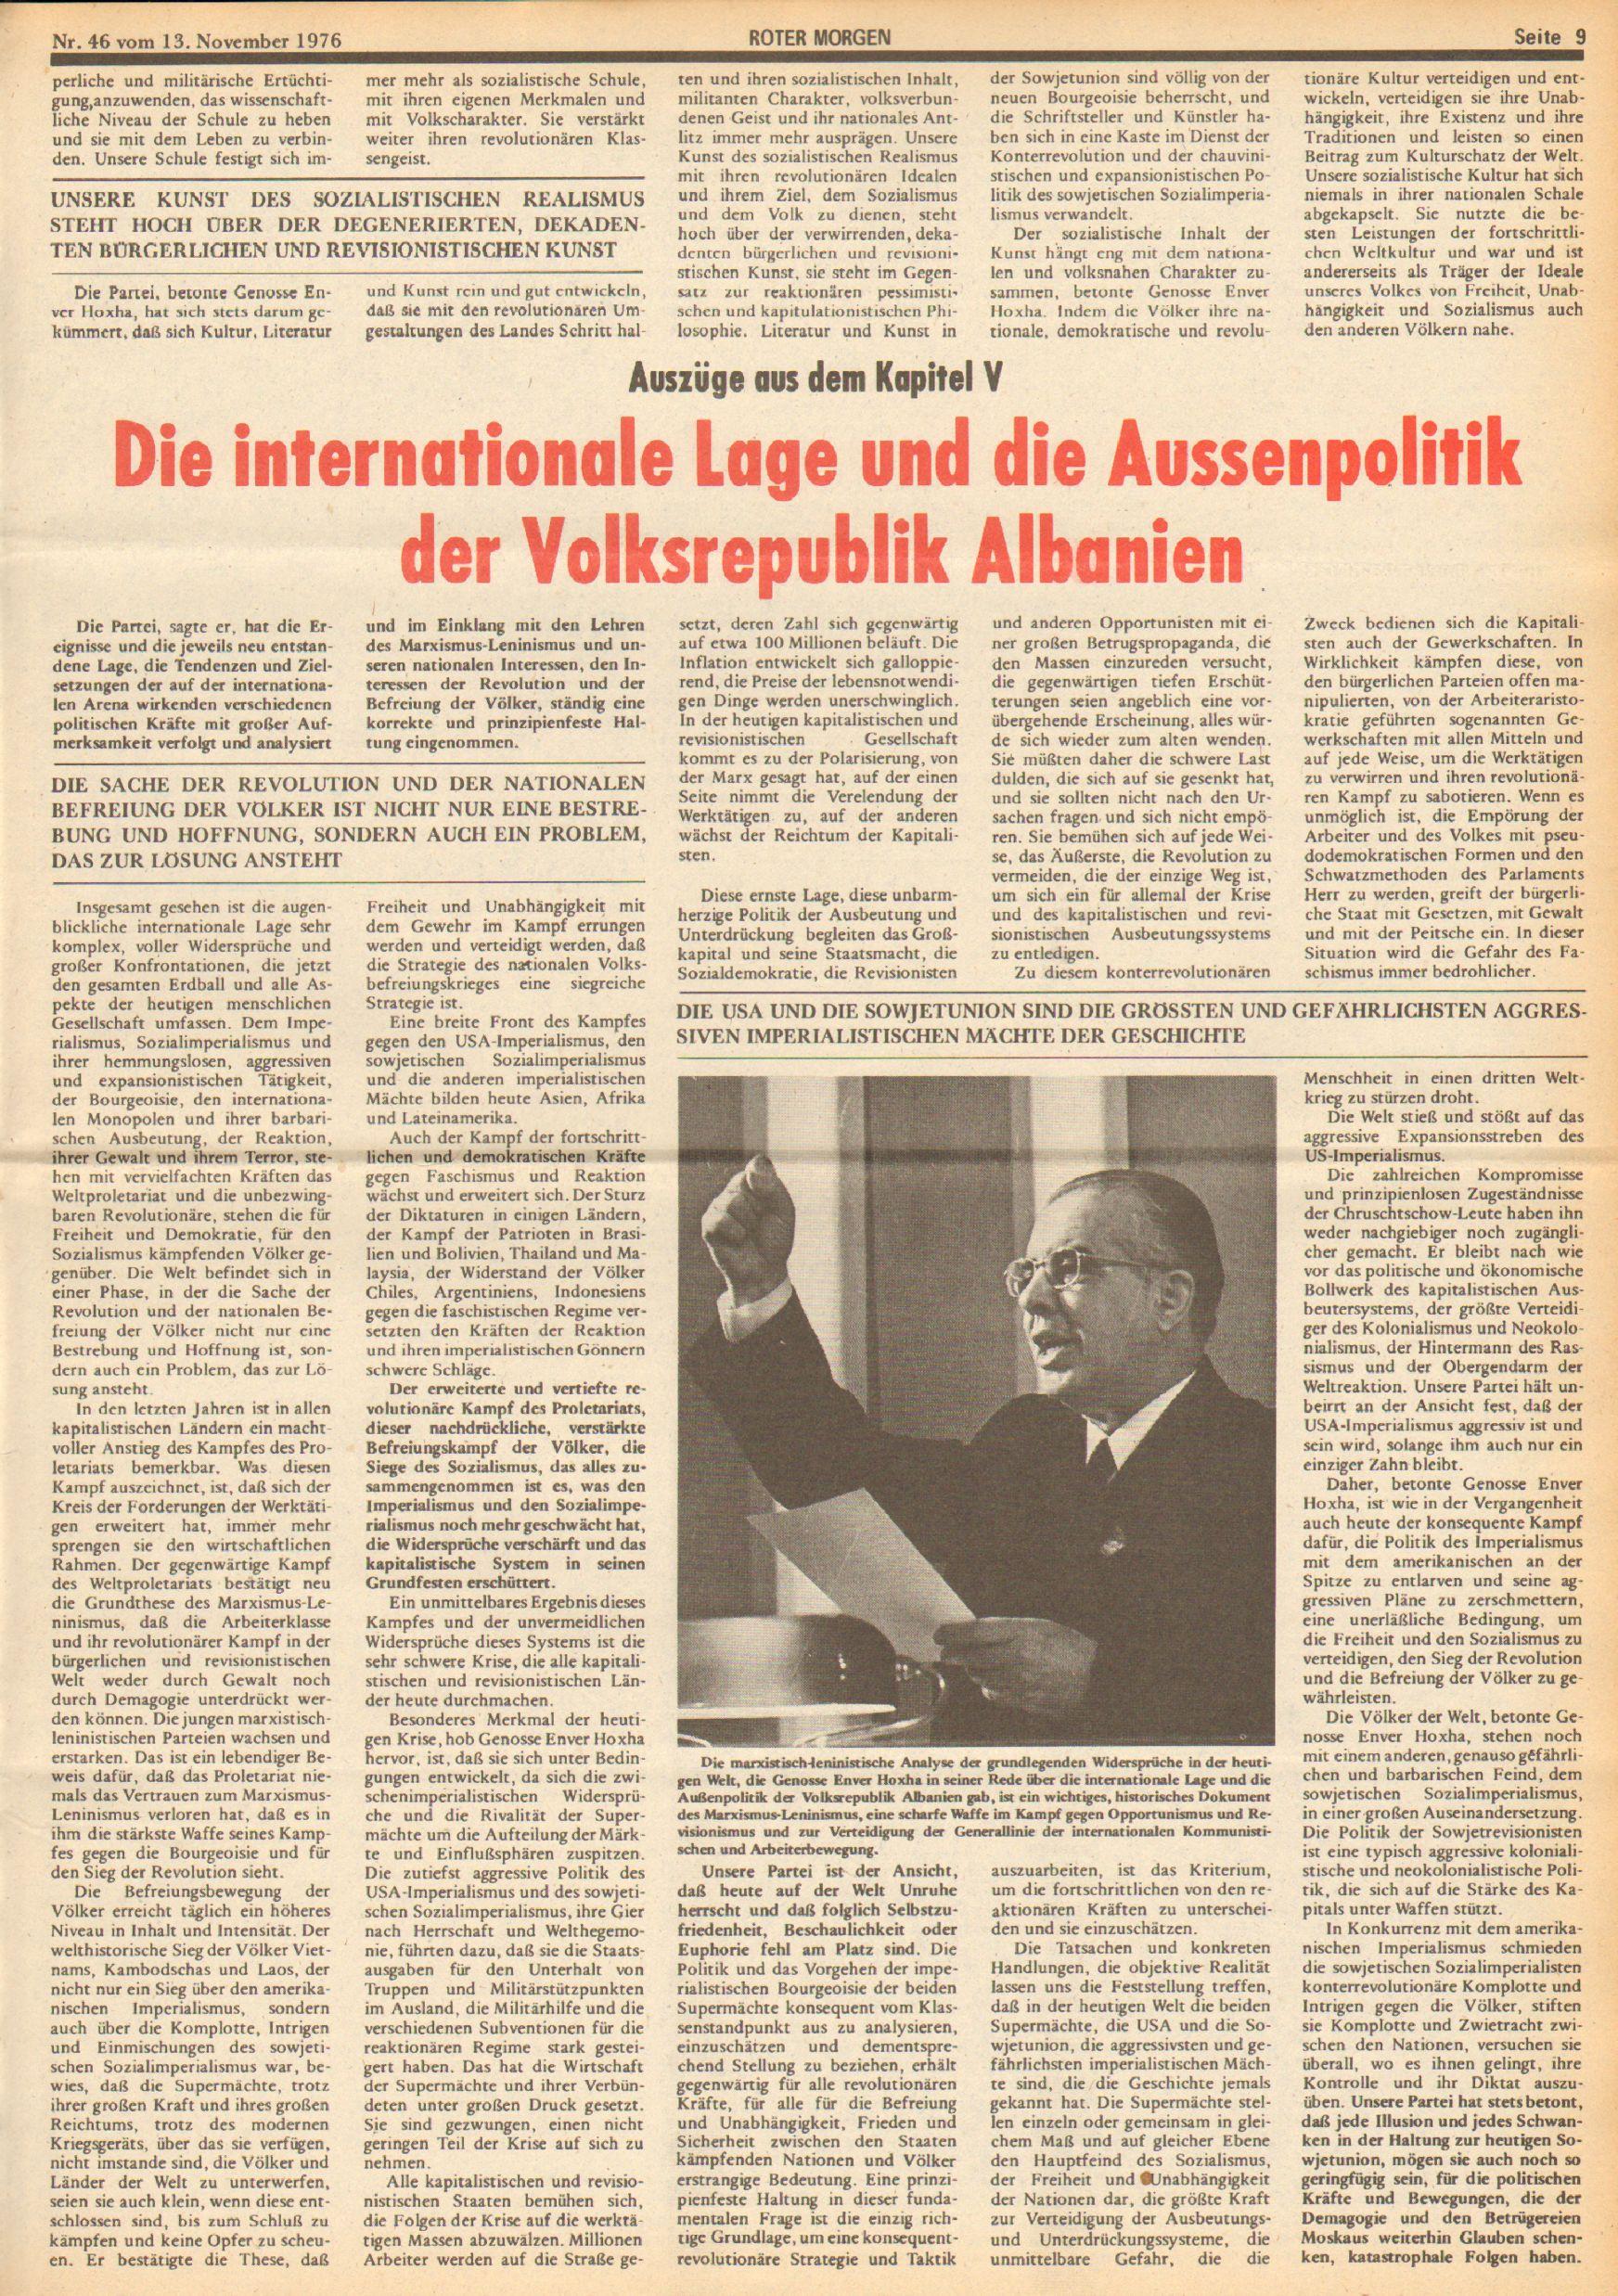 Roter Morgen, 10. Jg., 13. November 1976, Nr. 46, Seite 9